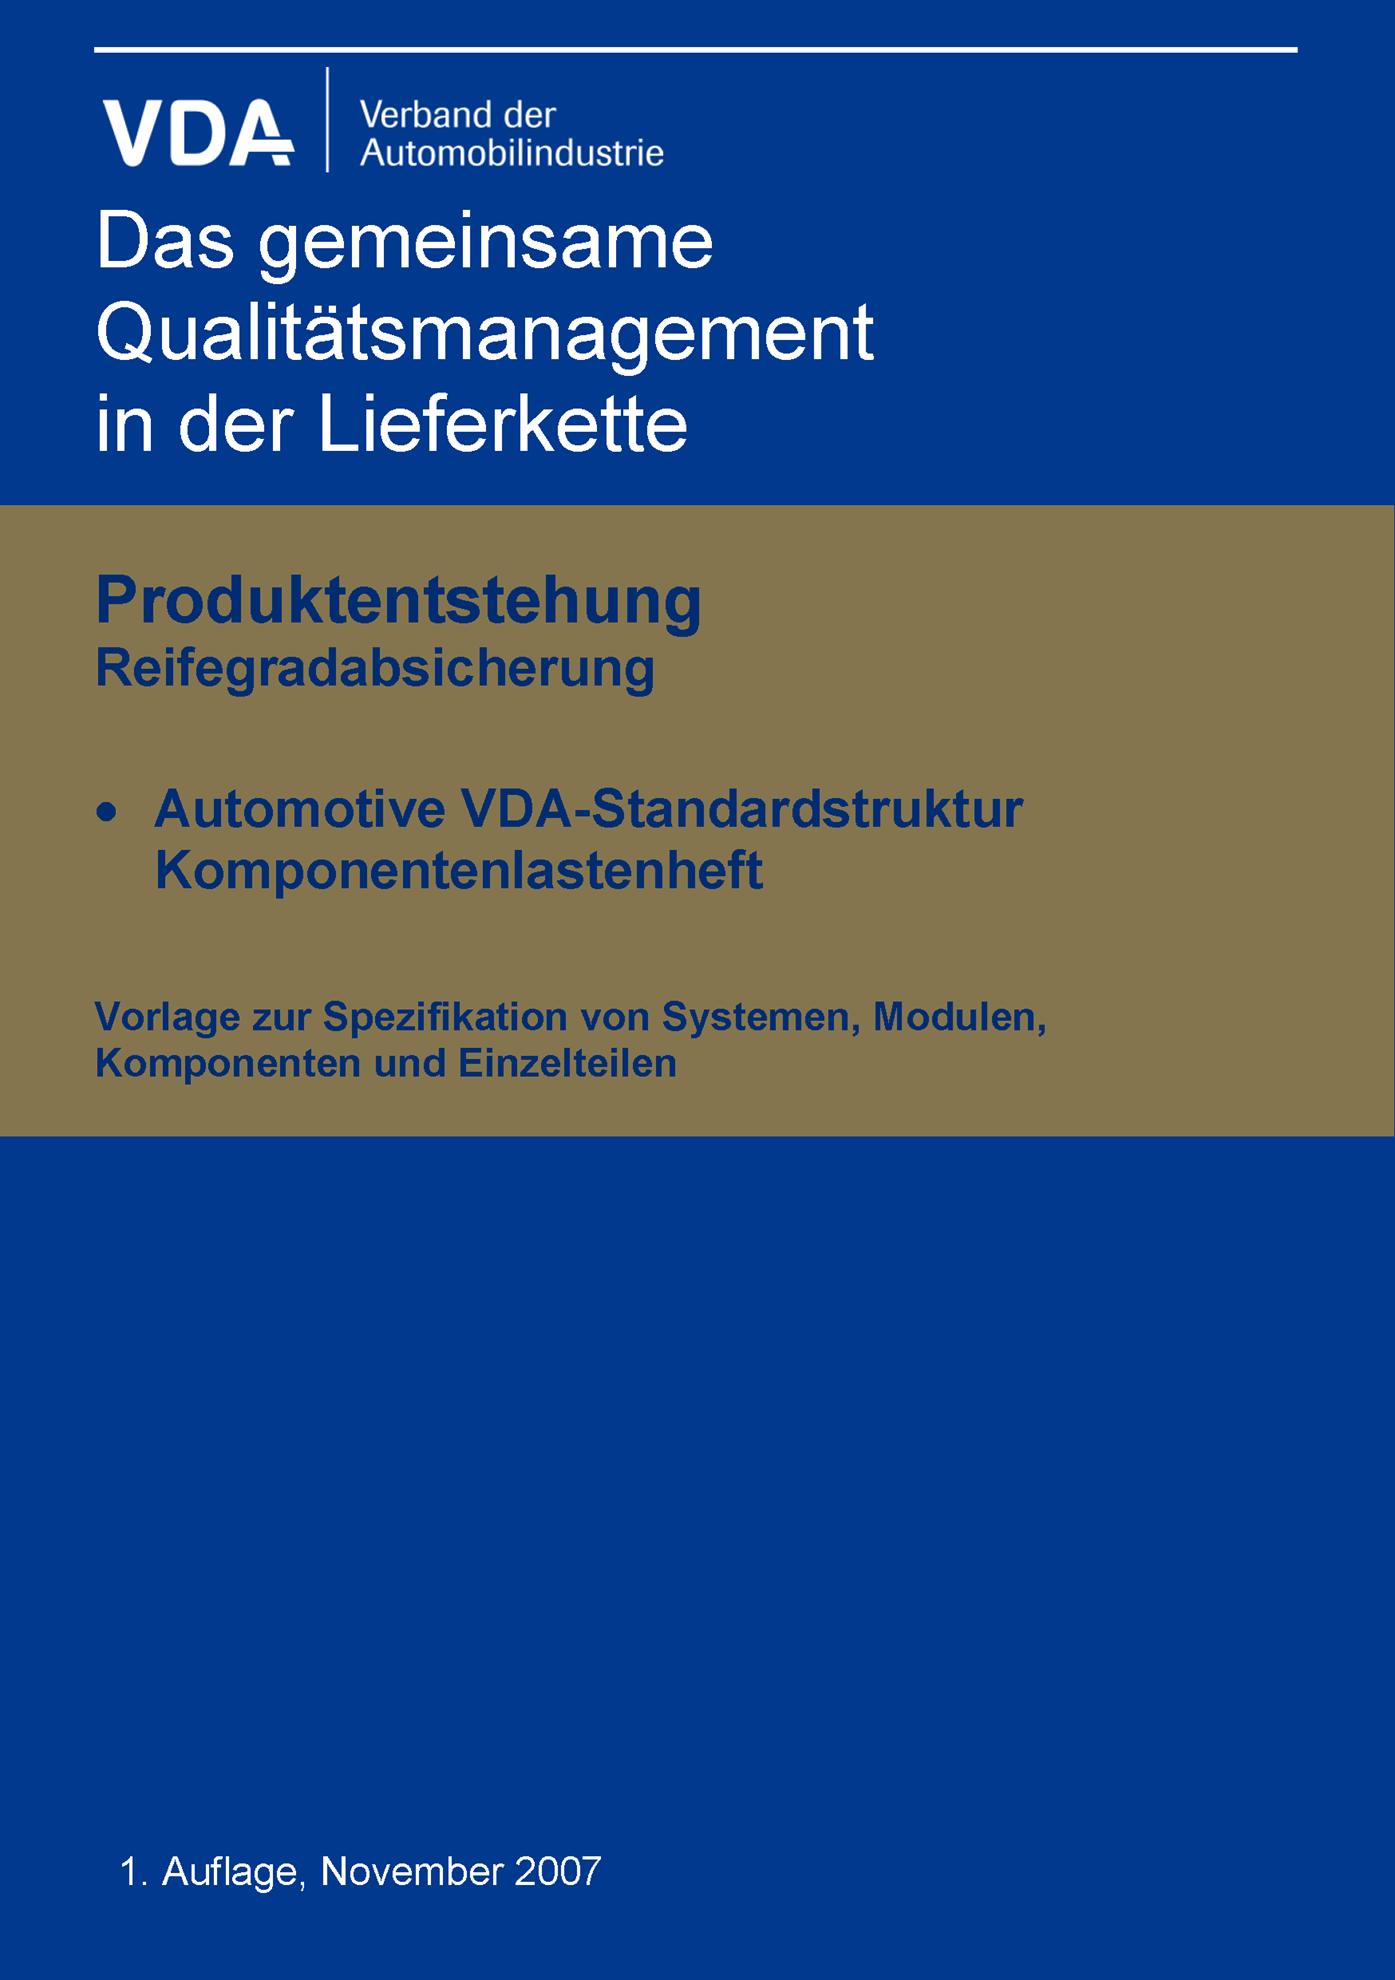 Picture of Komponentenlastenheft-Automotive Standardstruktur